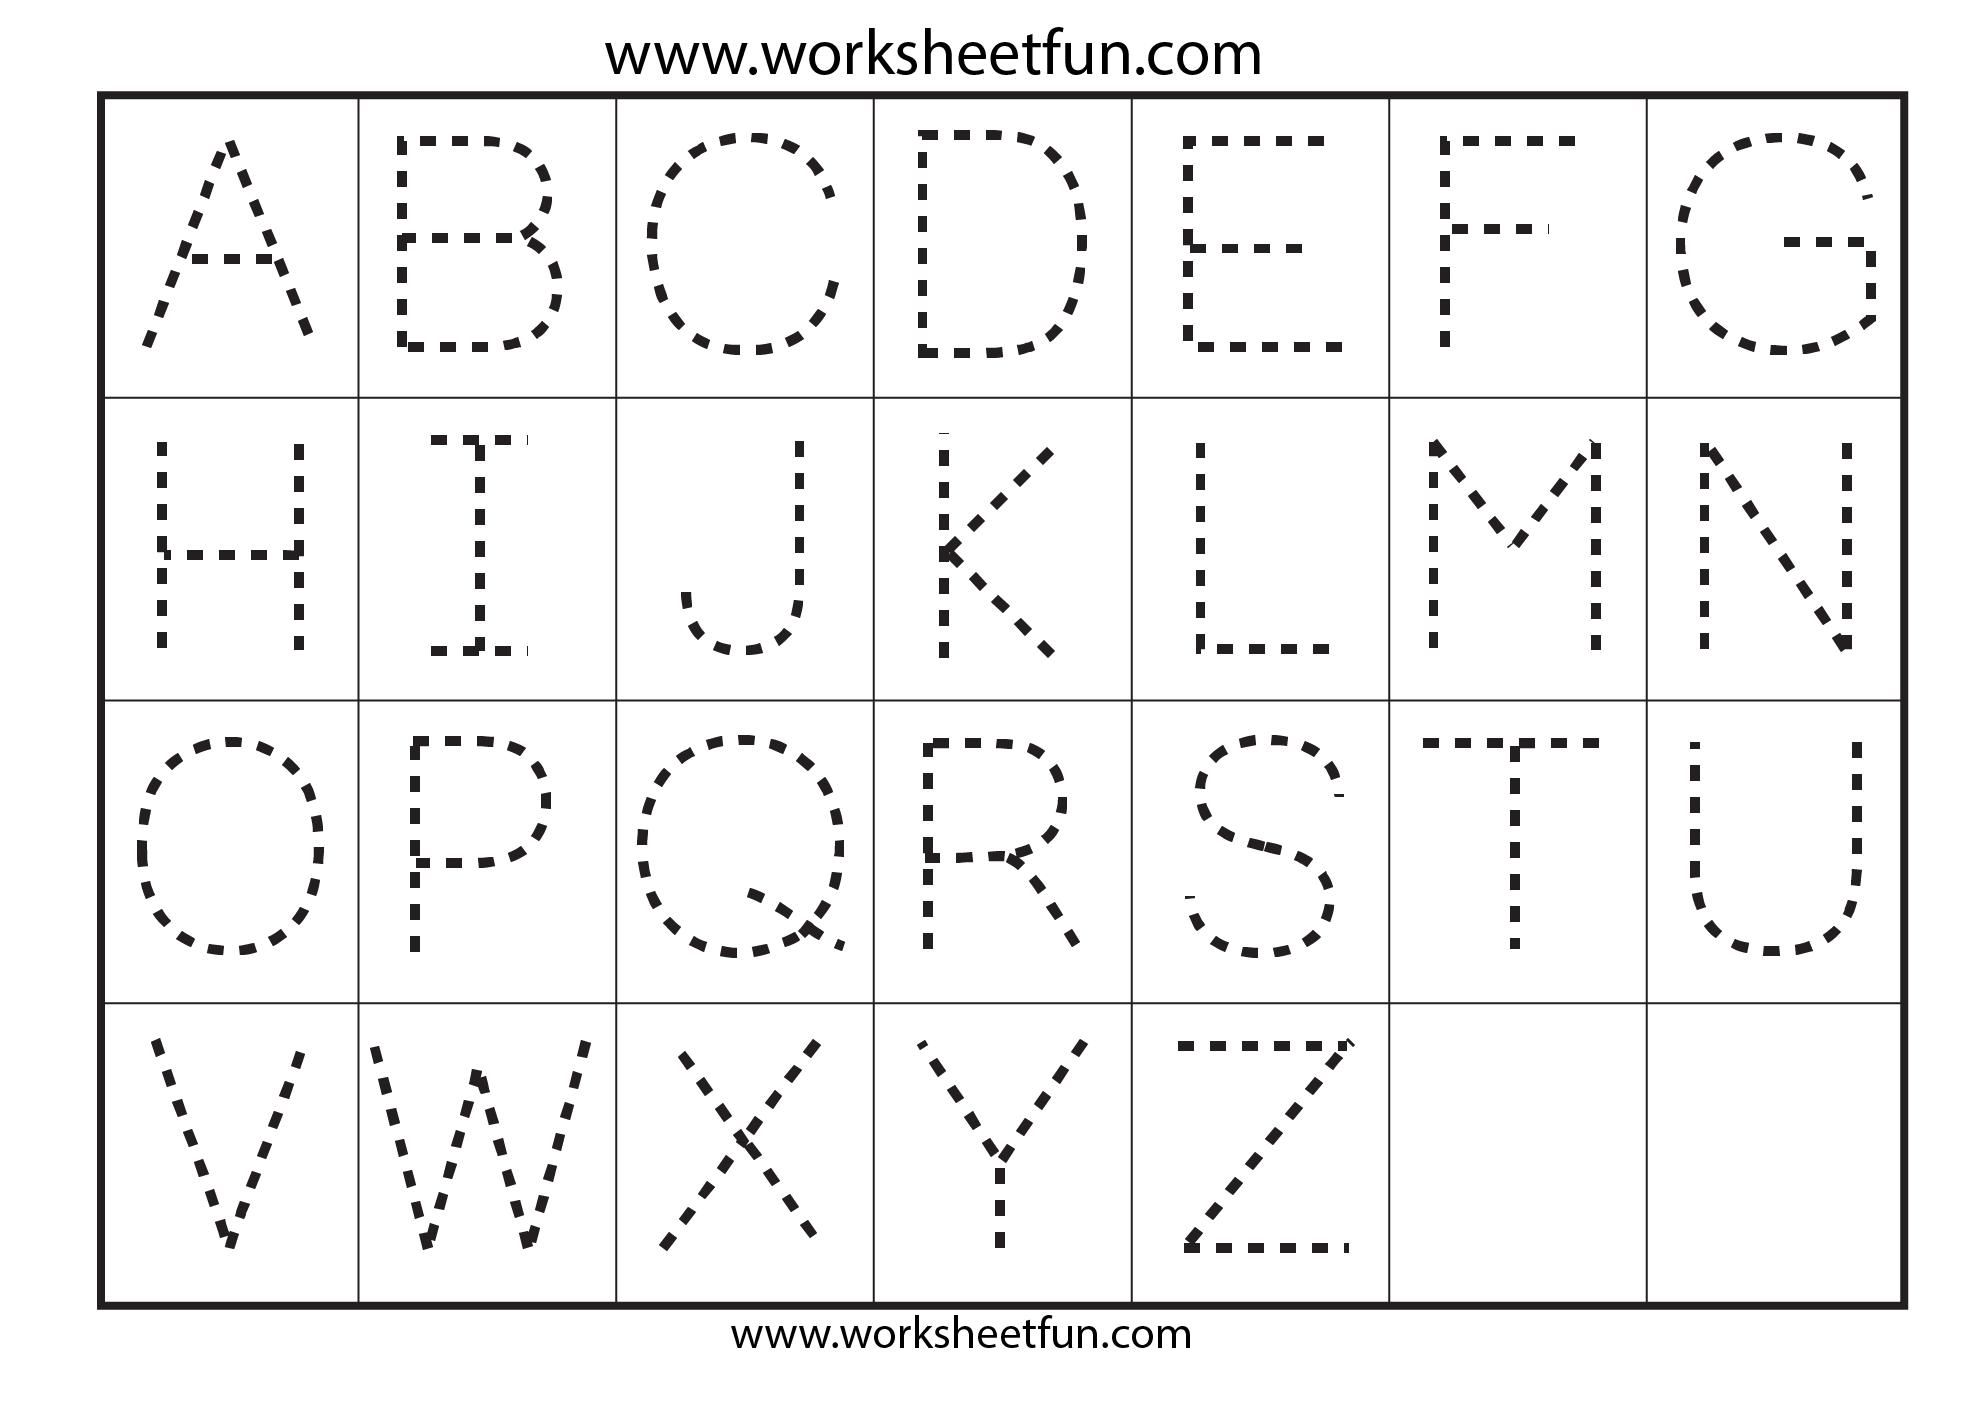 Preschool Worksheets Alphabet Tracing Letter A | Printable within Tracing Letters Worksheets For Nursery